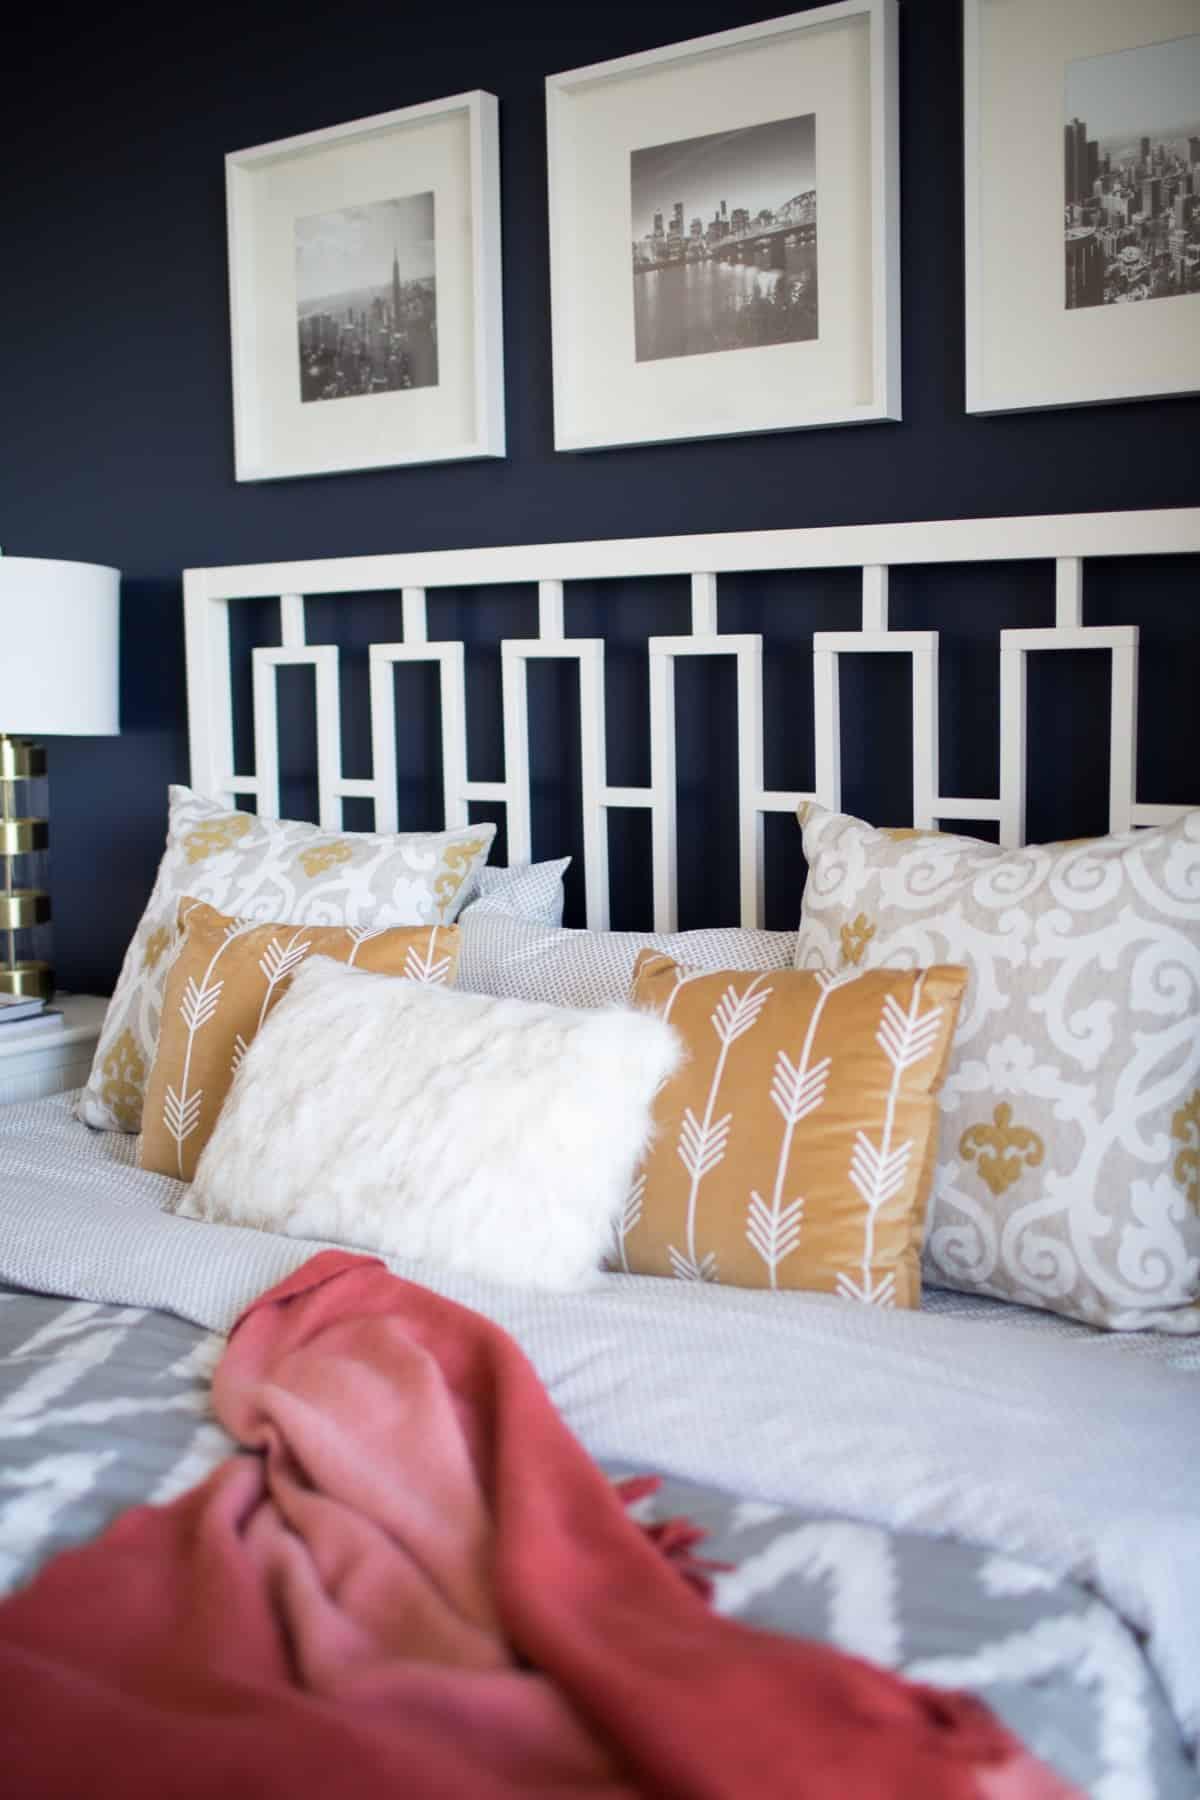 The best navy bedroom wall idea